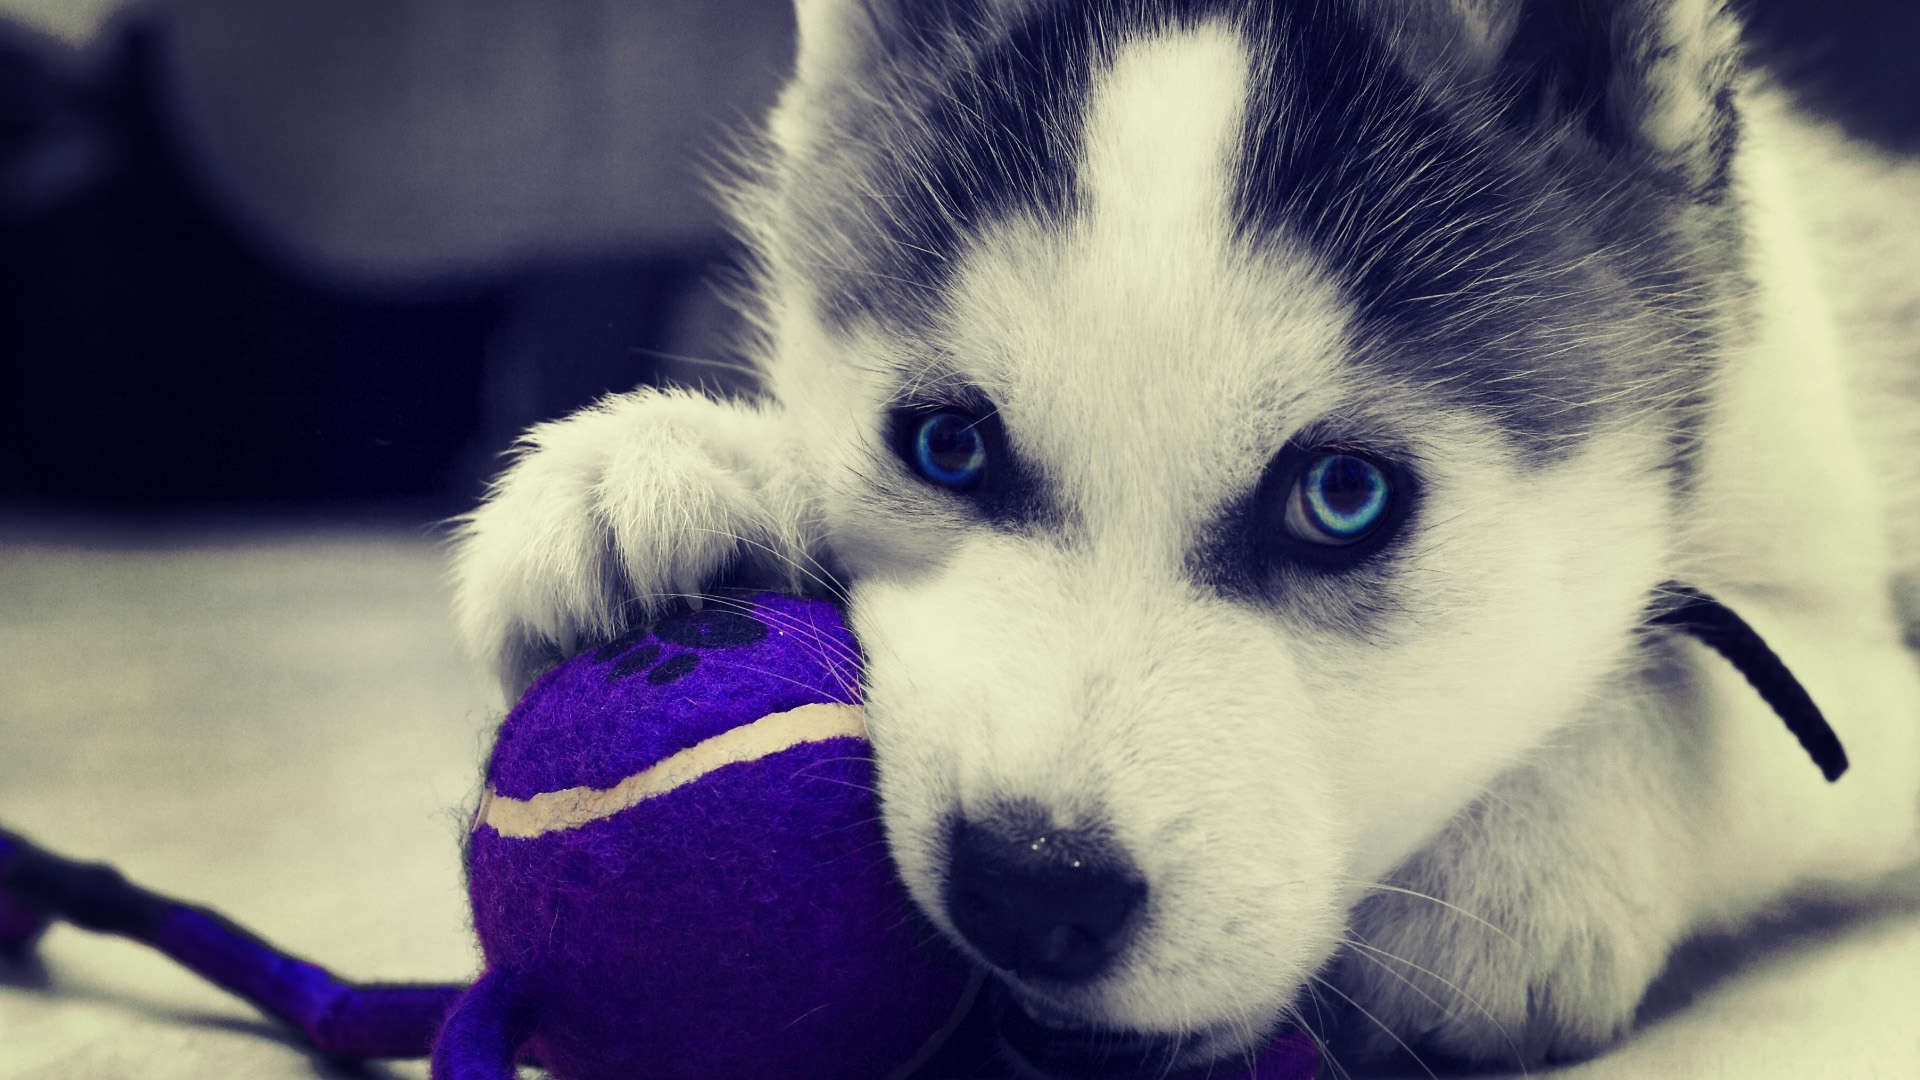 Siberian Husky Puppies Wallpaper HD 1080p Cute husky